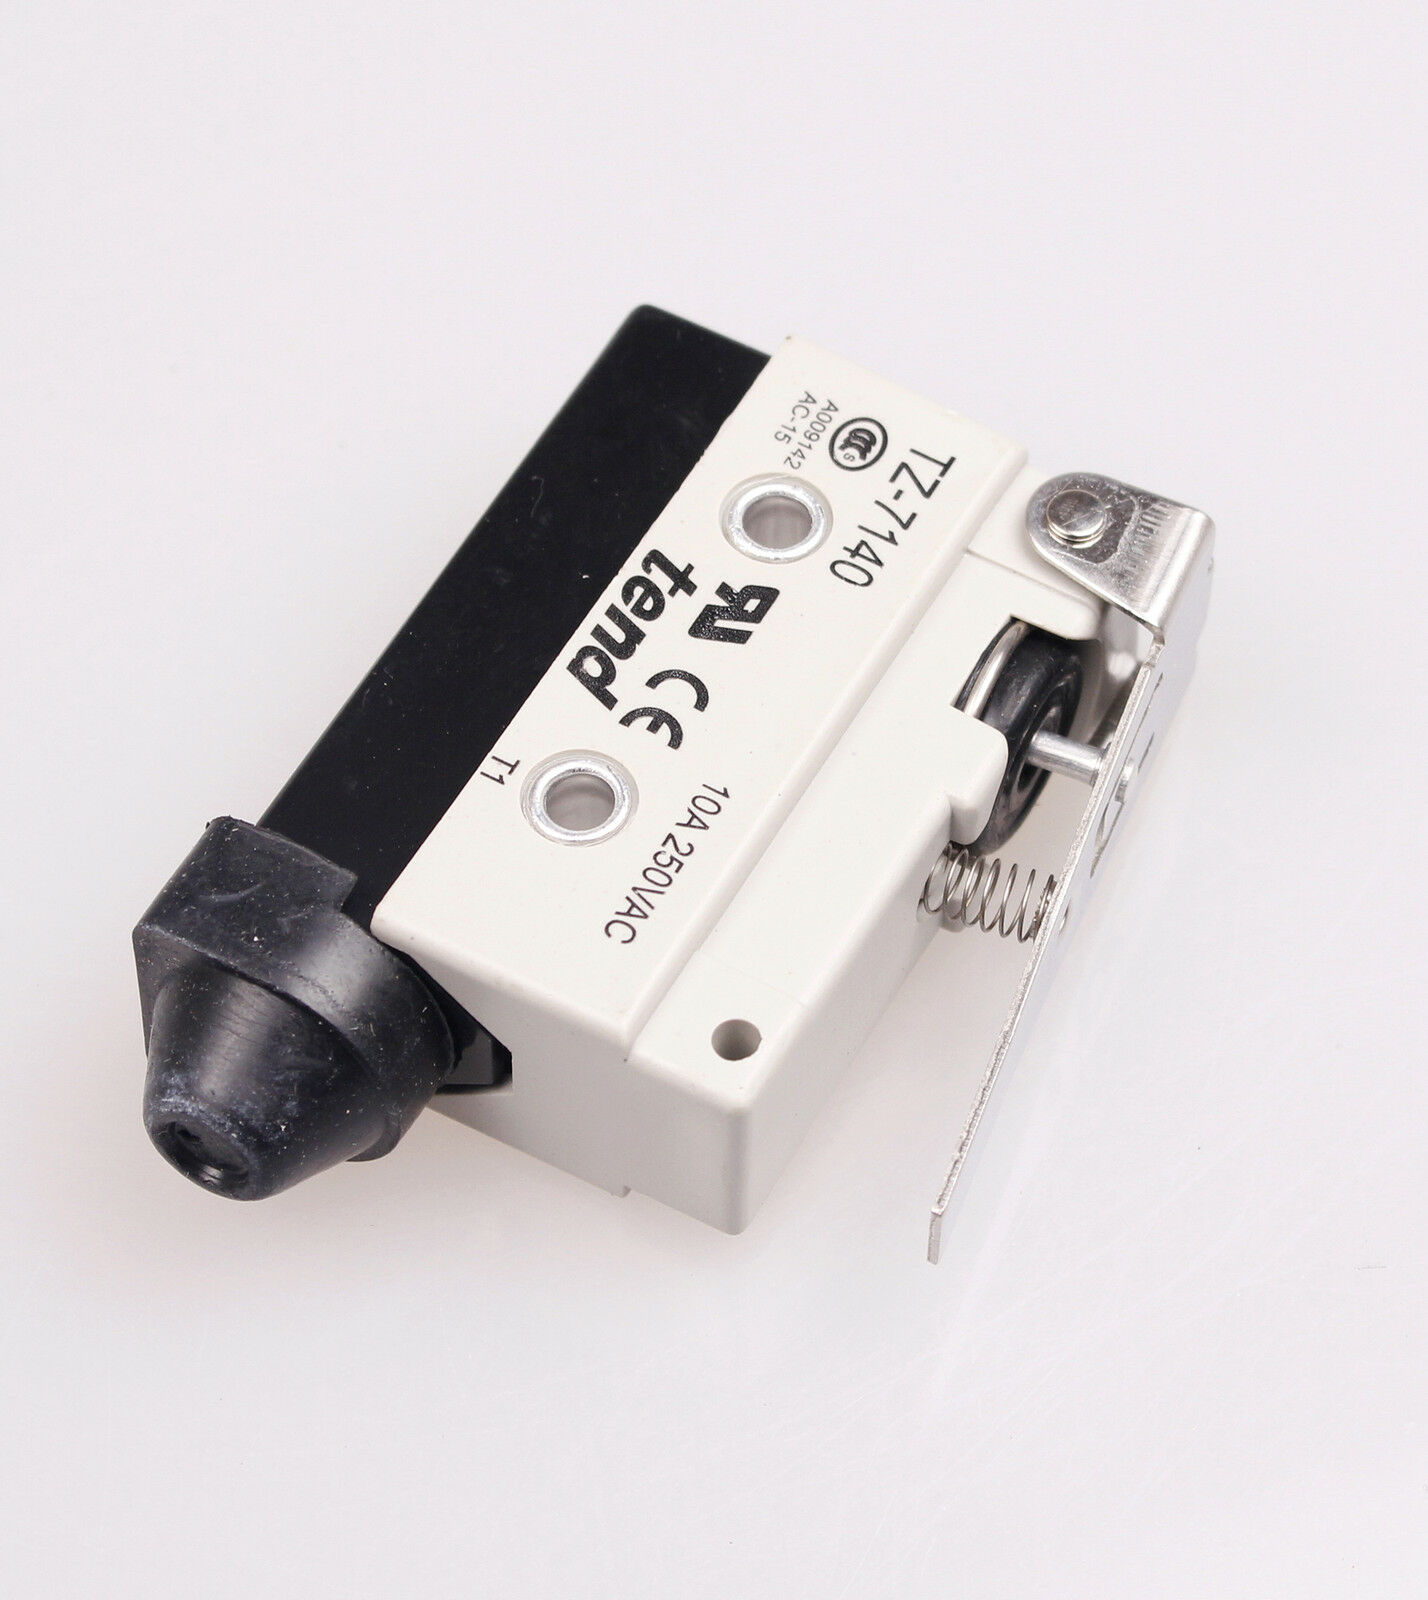 AC 380V 10A Hinge Lever Type SPDT Snap Action Limit Switch TZ-7140